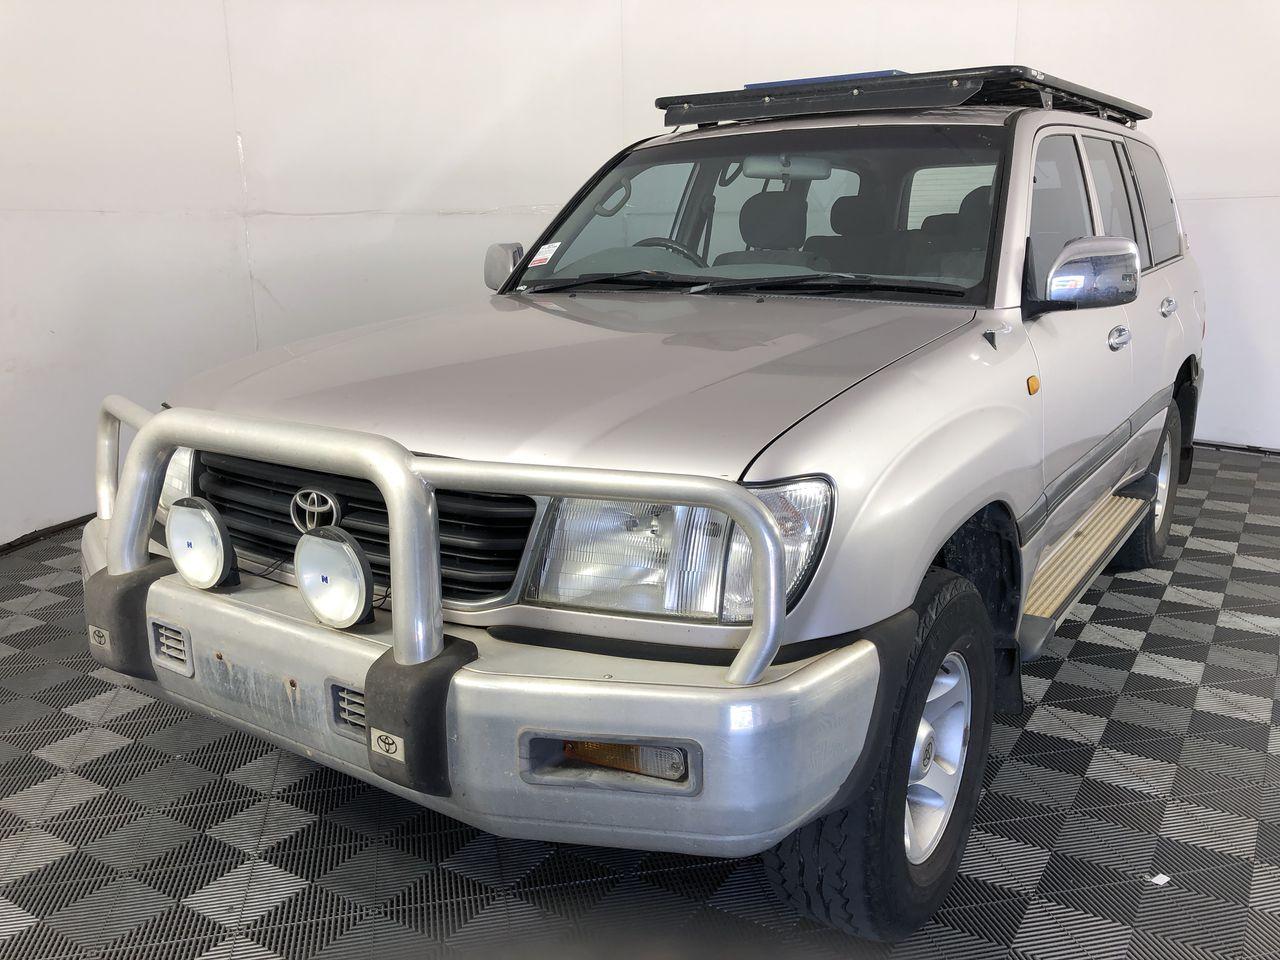 1999 Toyota Landcruiser RV 4WD FZJ105R Automatic 7 Seater